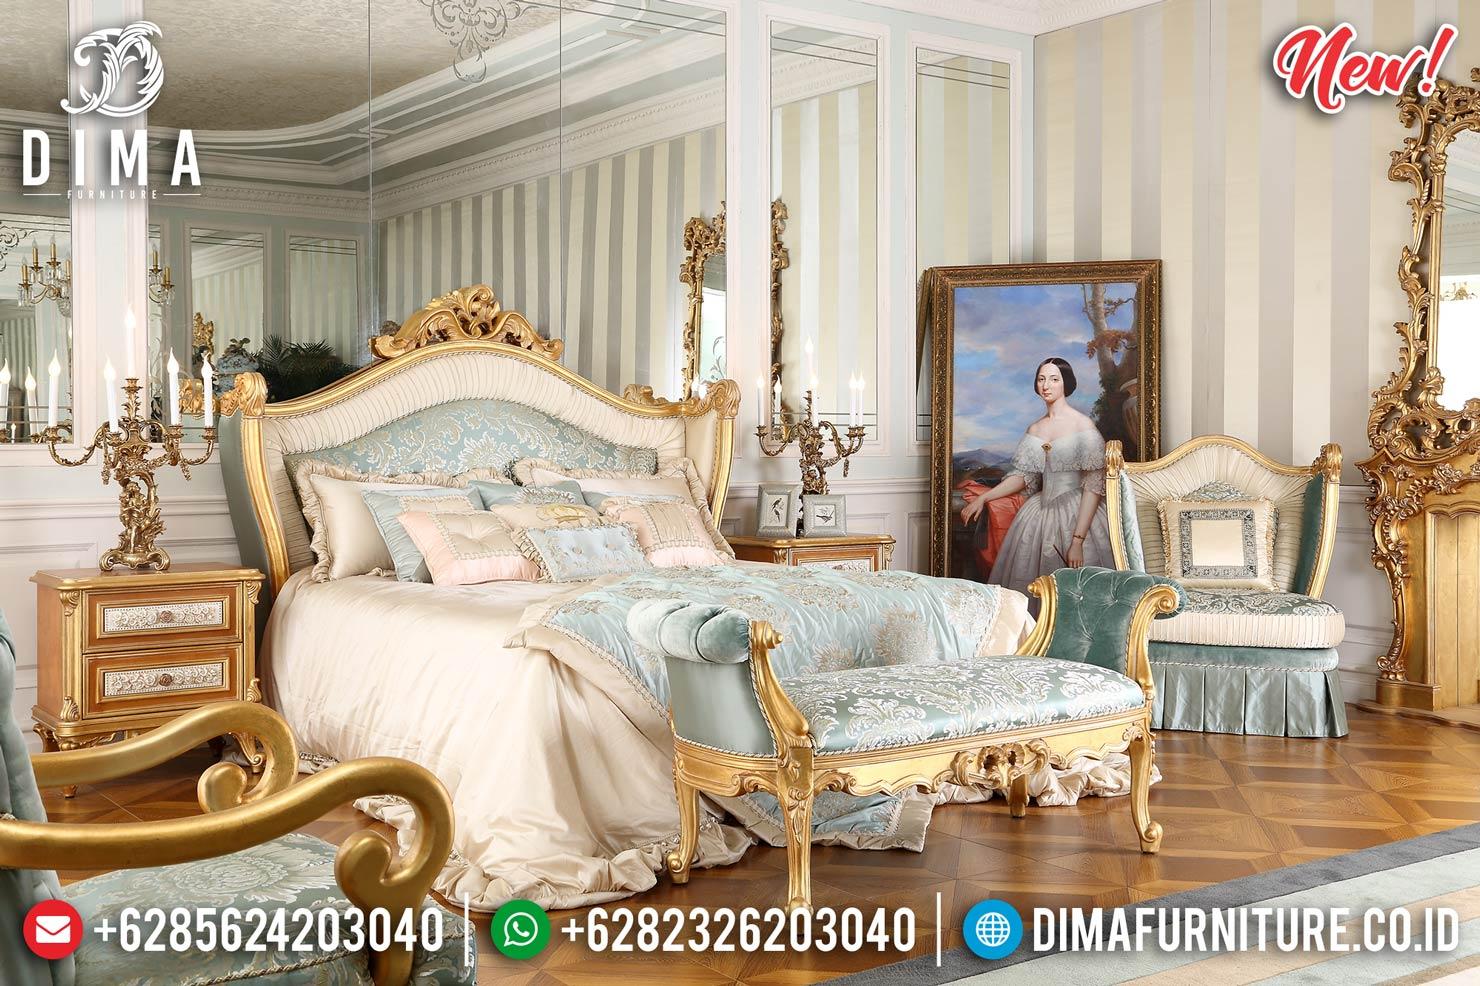 Golden Classic Carving Tempat Tidur Mewah Jepara Luxury Royals Furniture BT-0936